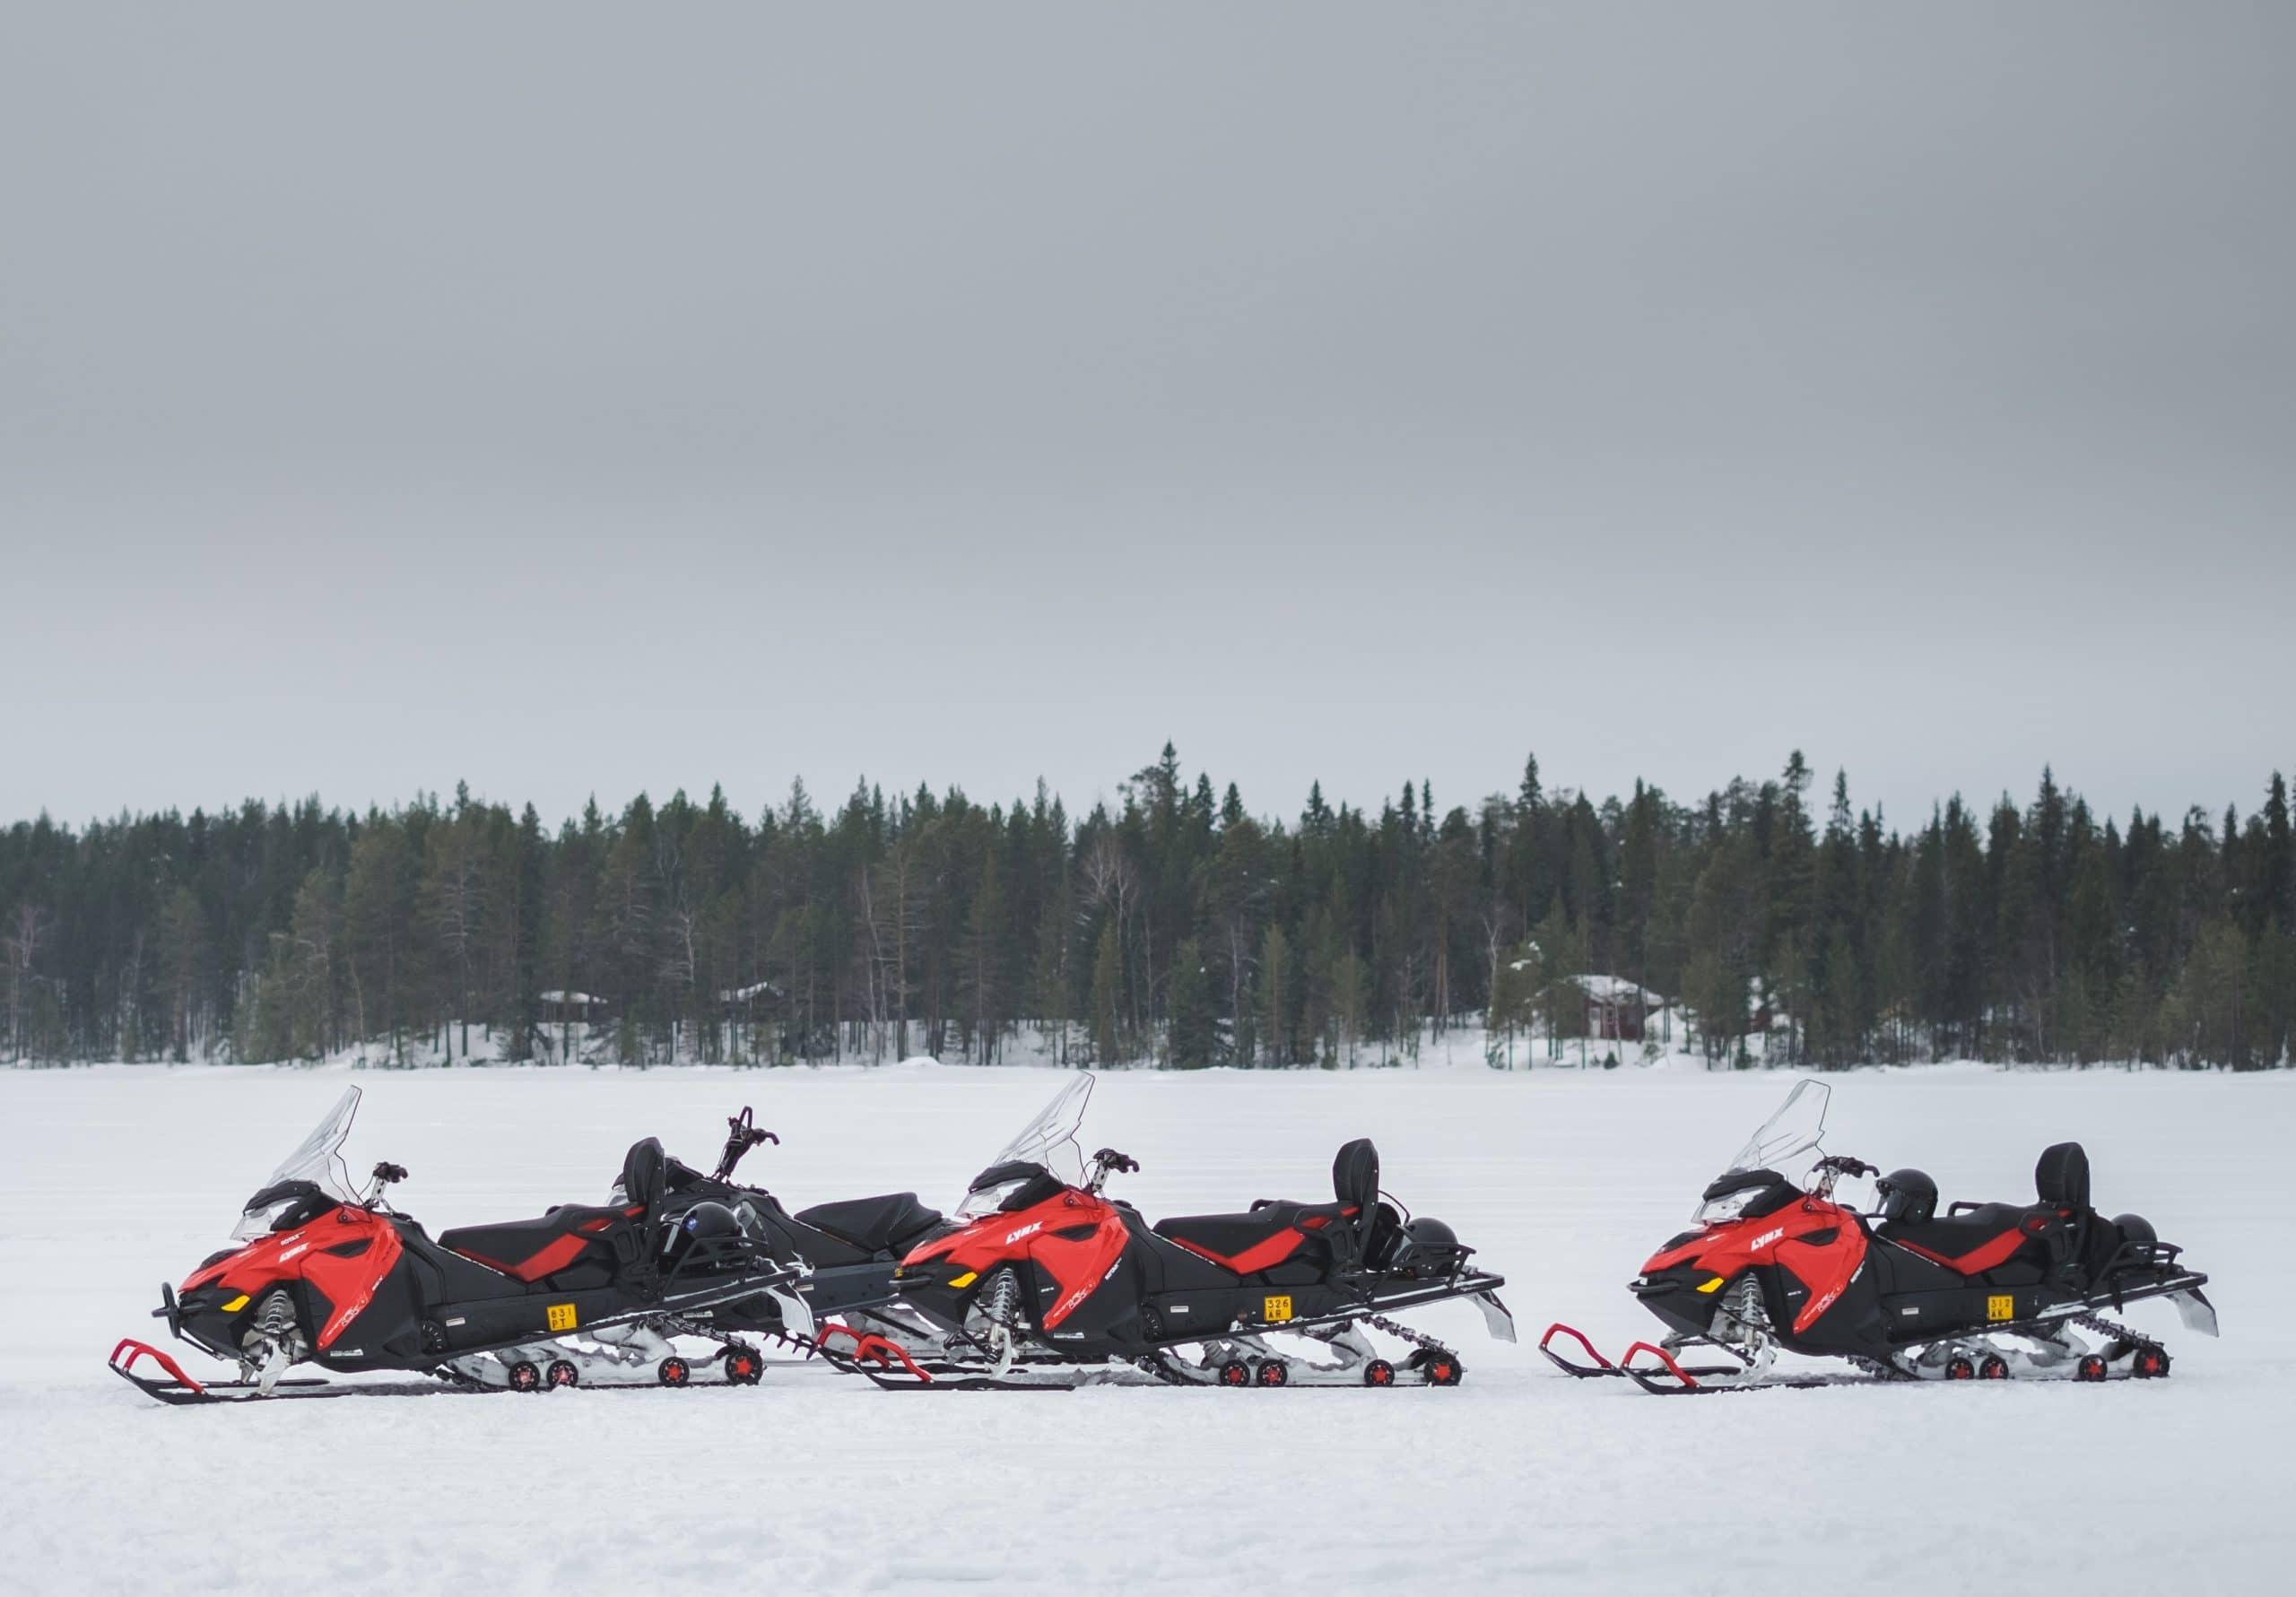 moto neige team building